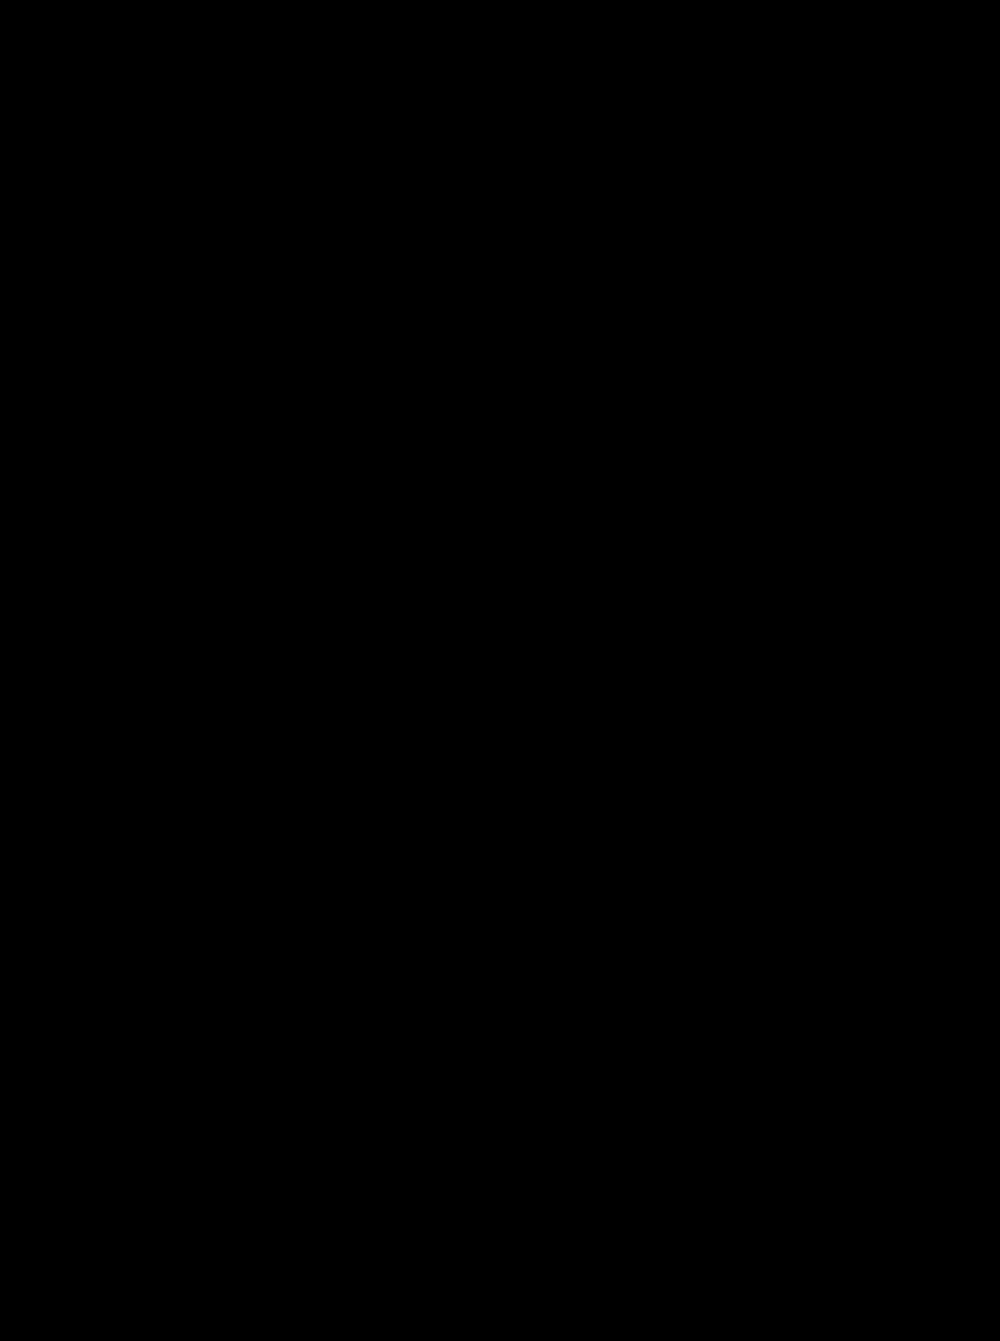 vector transparent stock File glass silhouette svg. Margarita clipart vector.